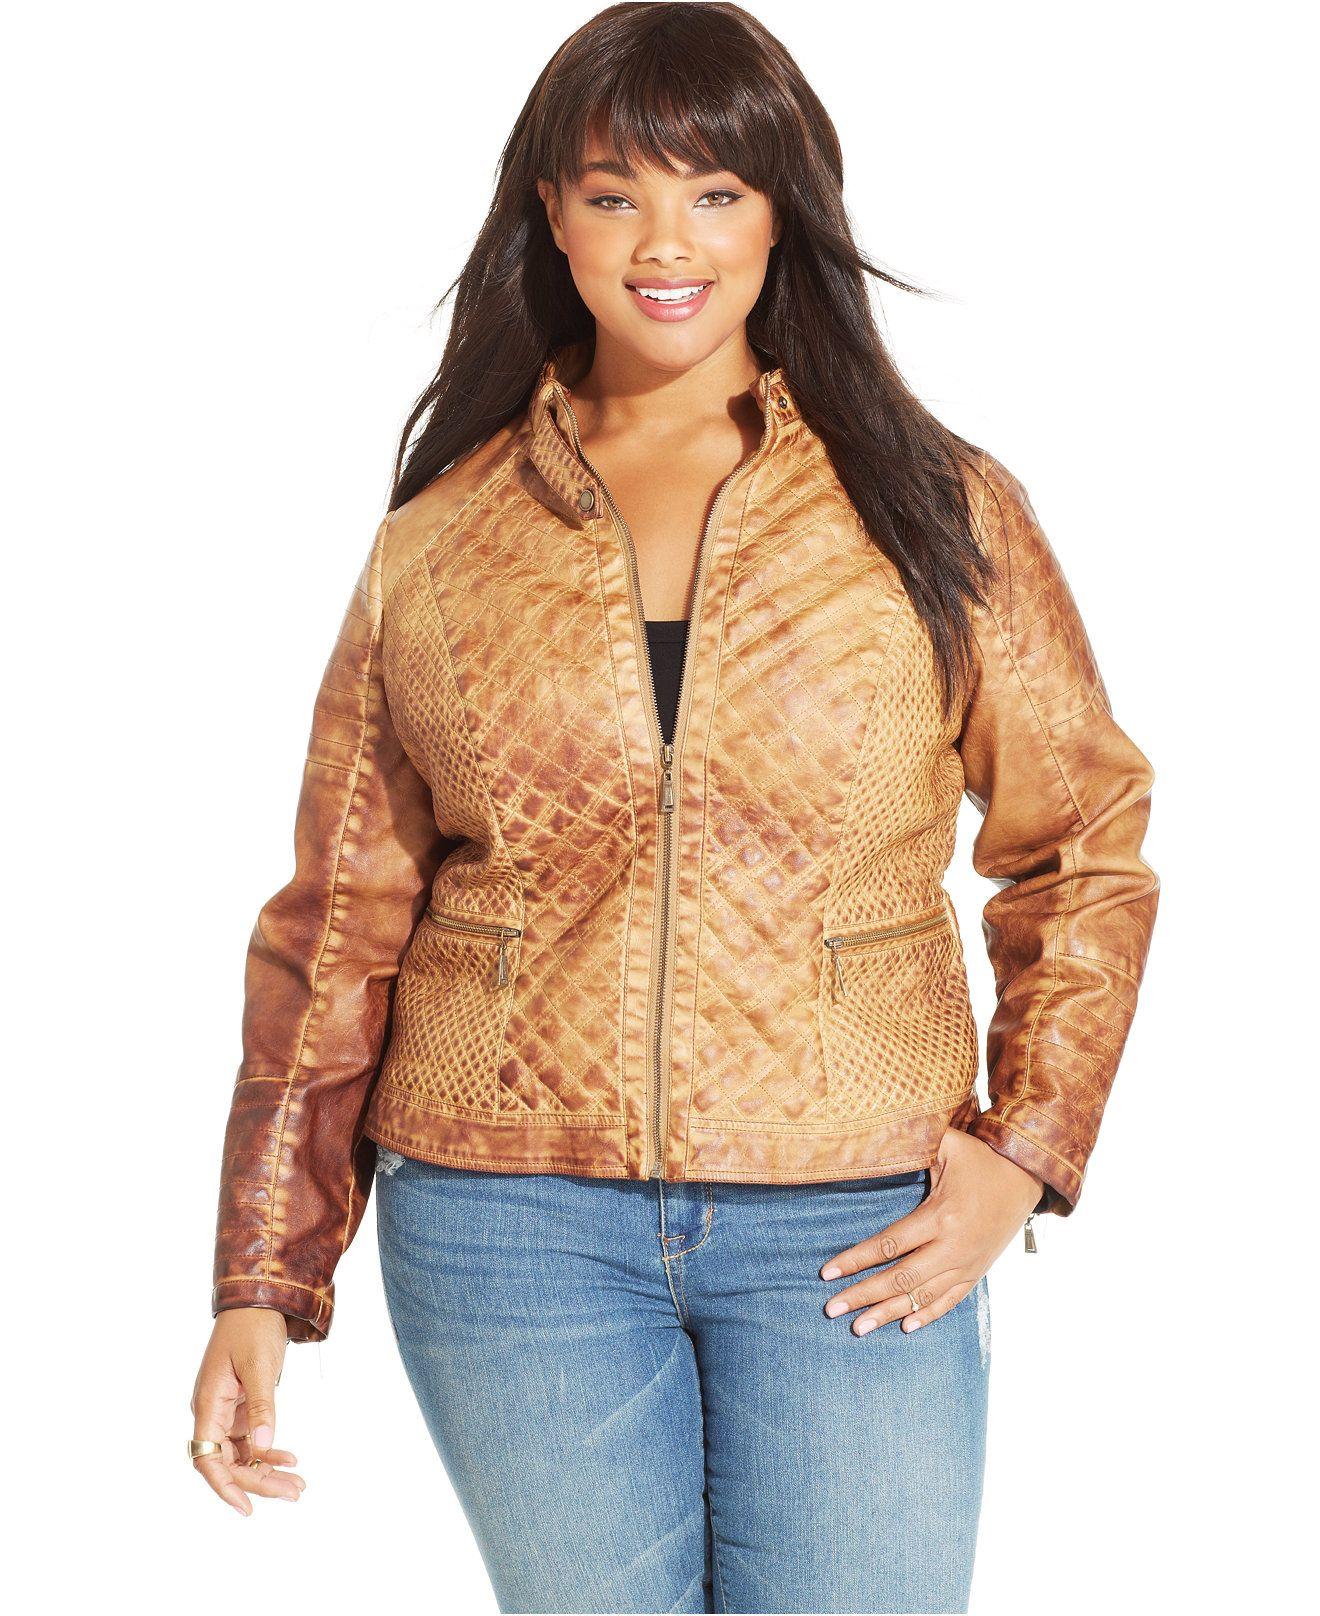 Jou Jou Plus Size FauxLeather Quilted Jacket Coats